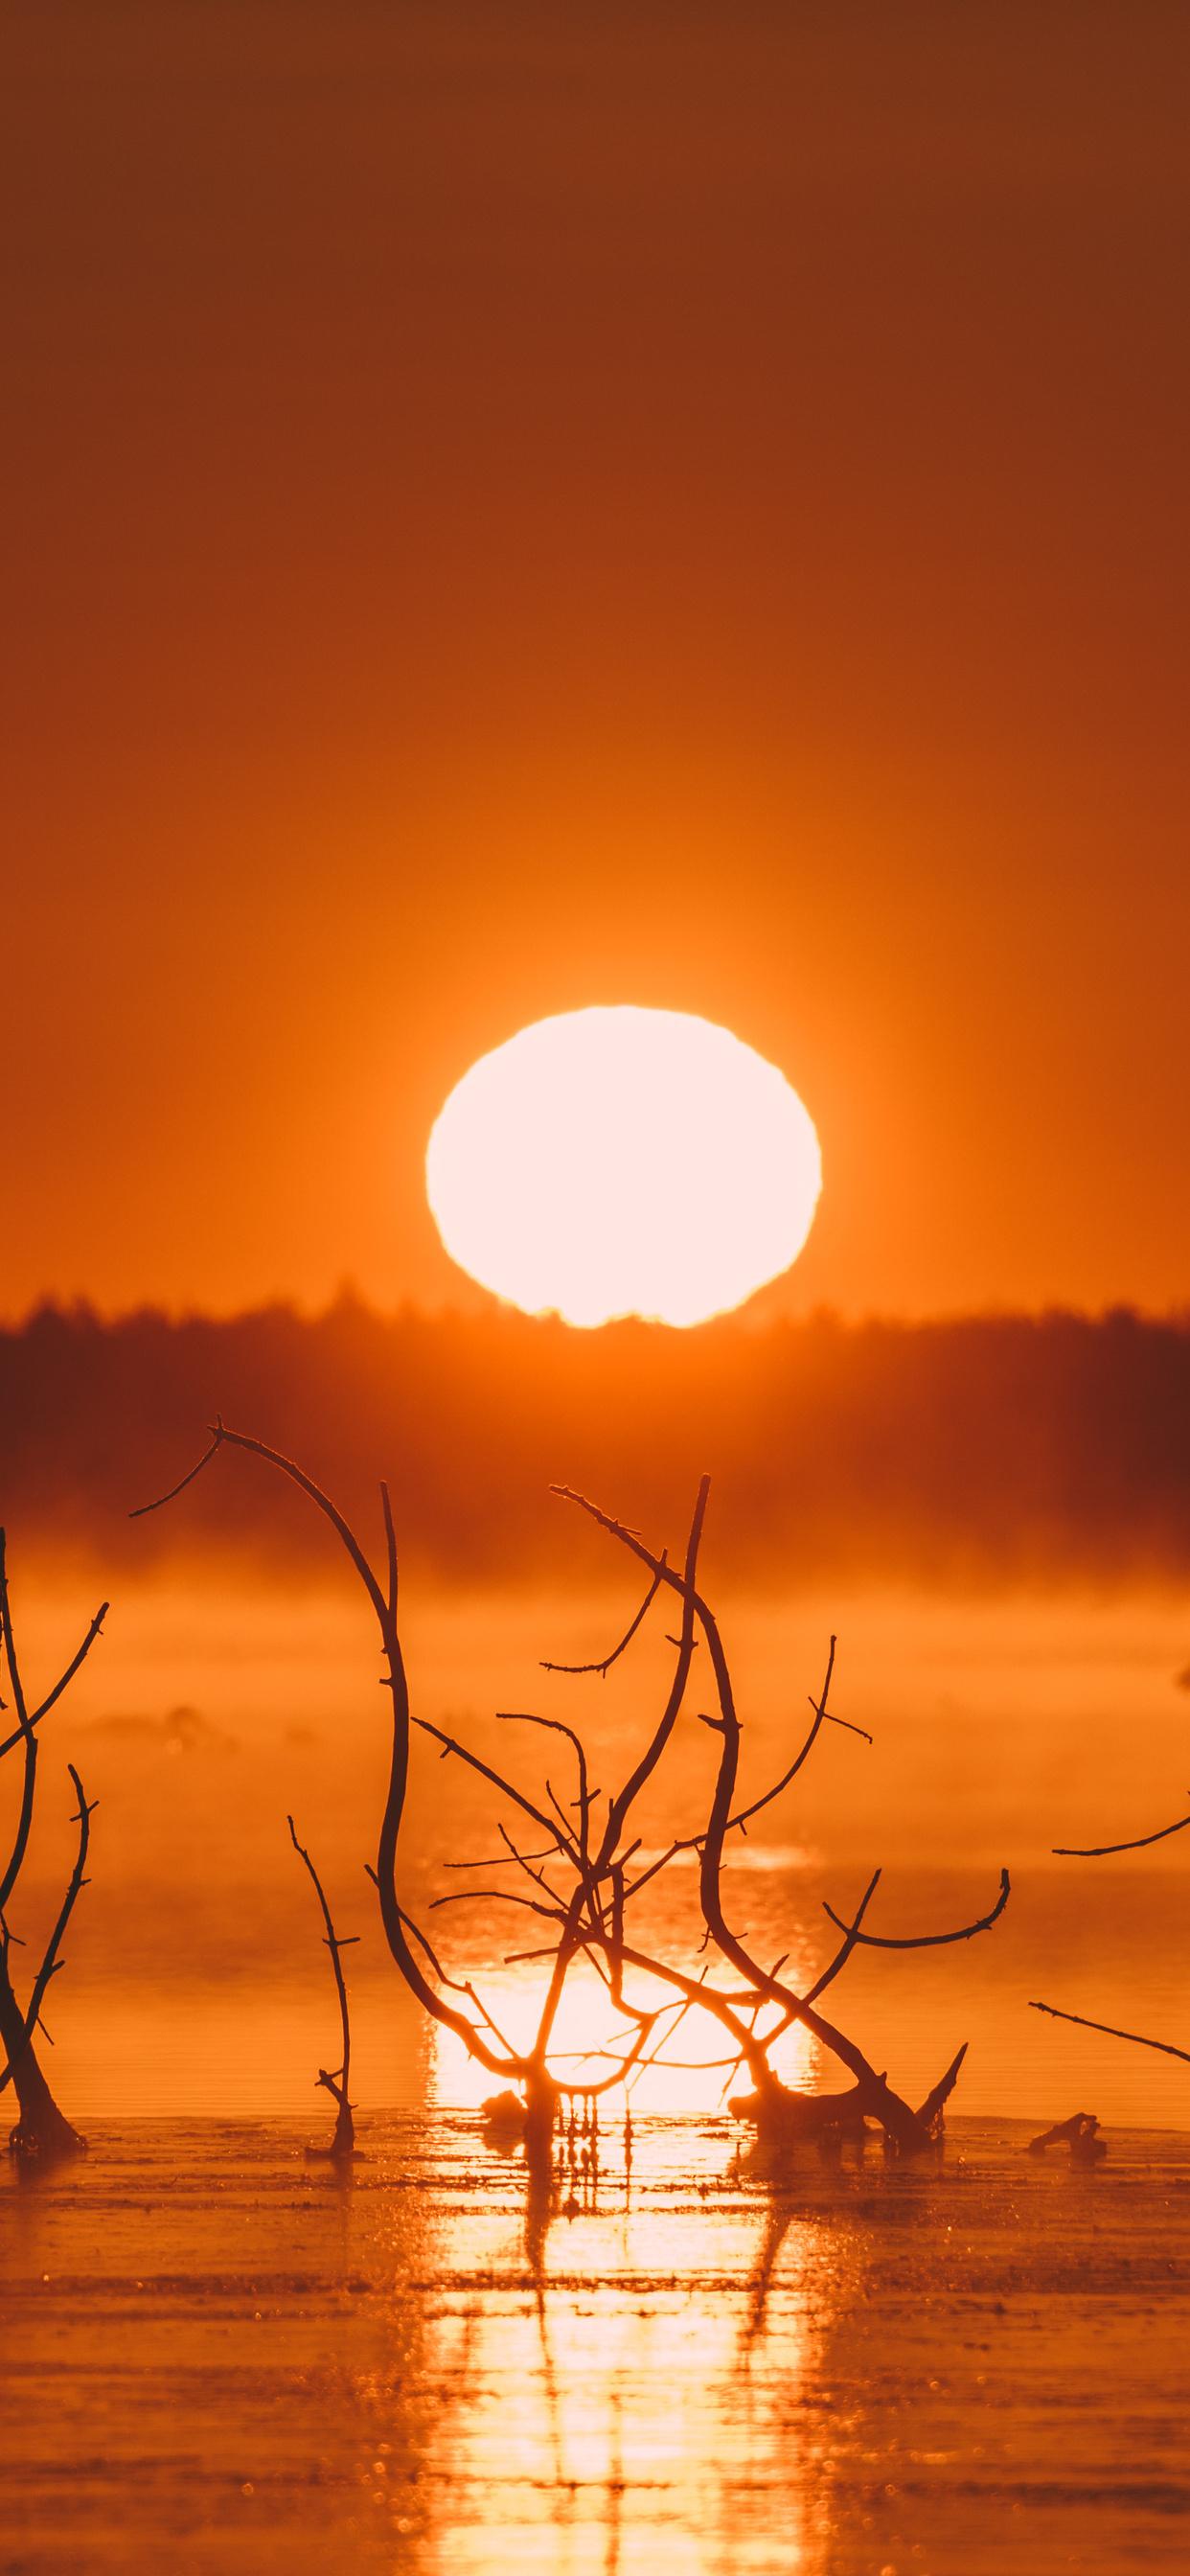 sunset-evening-5k-3i.jpg